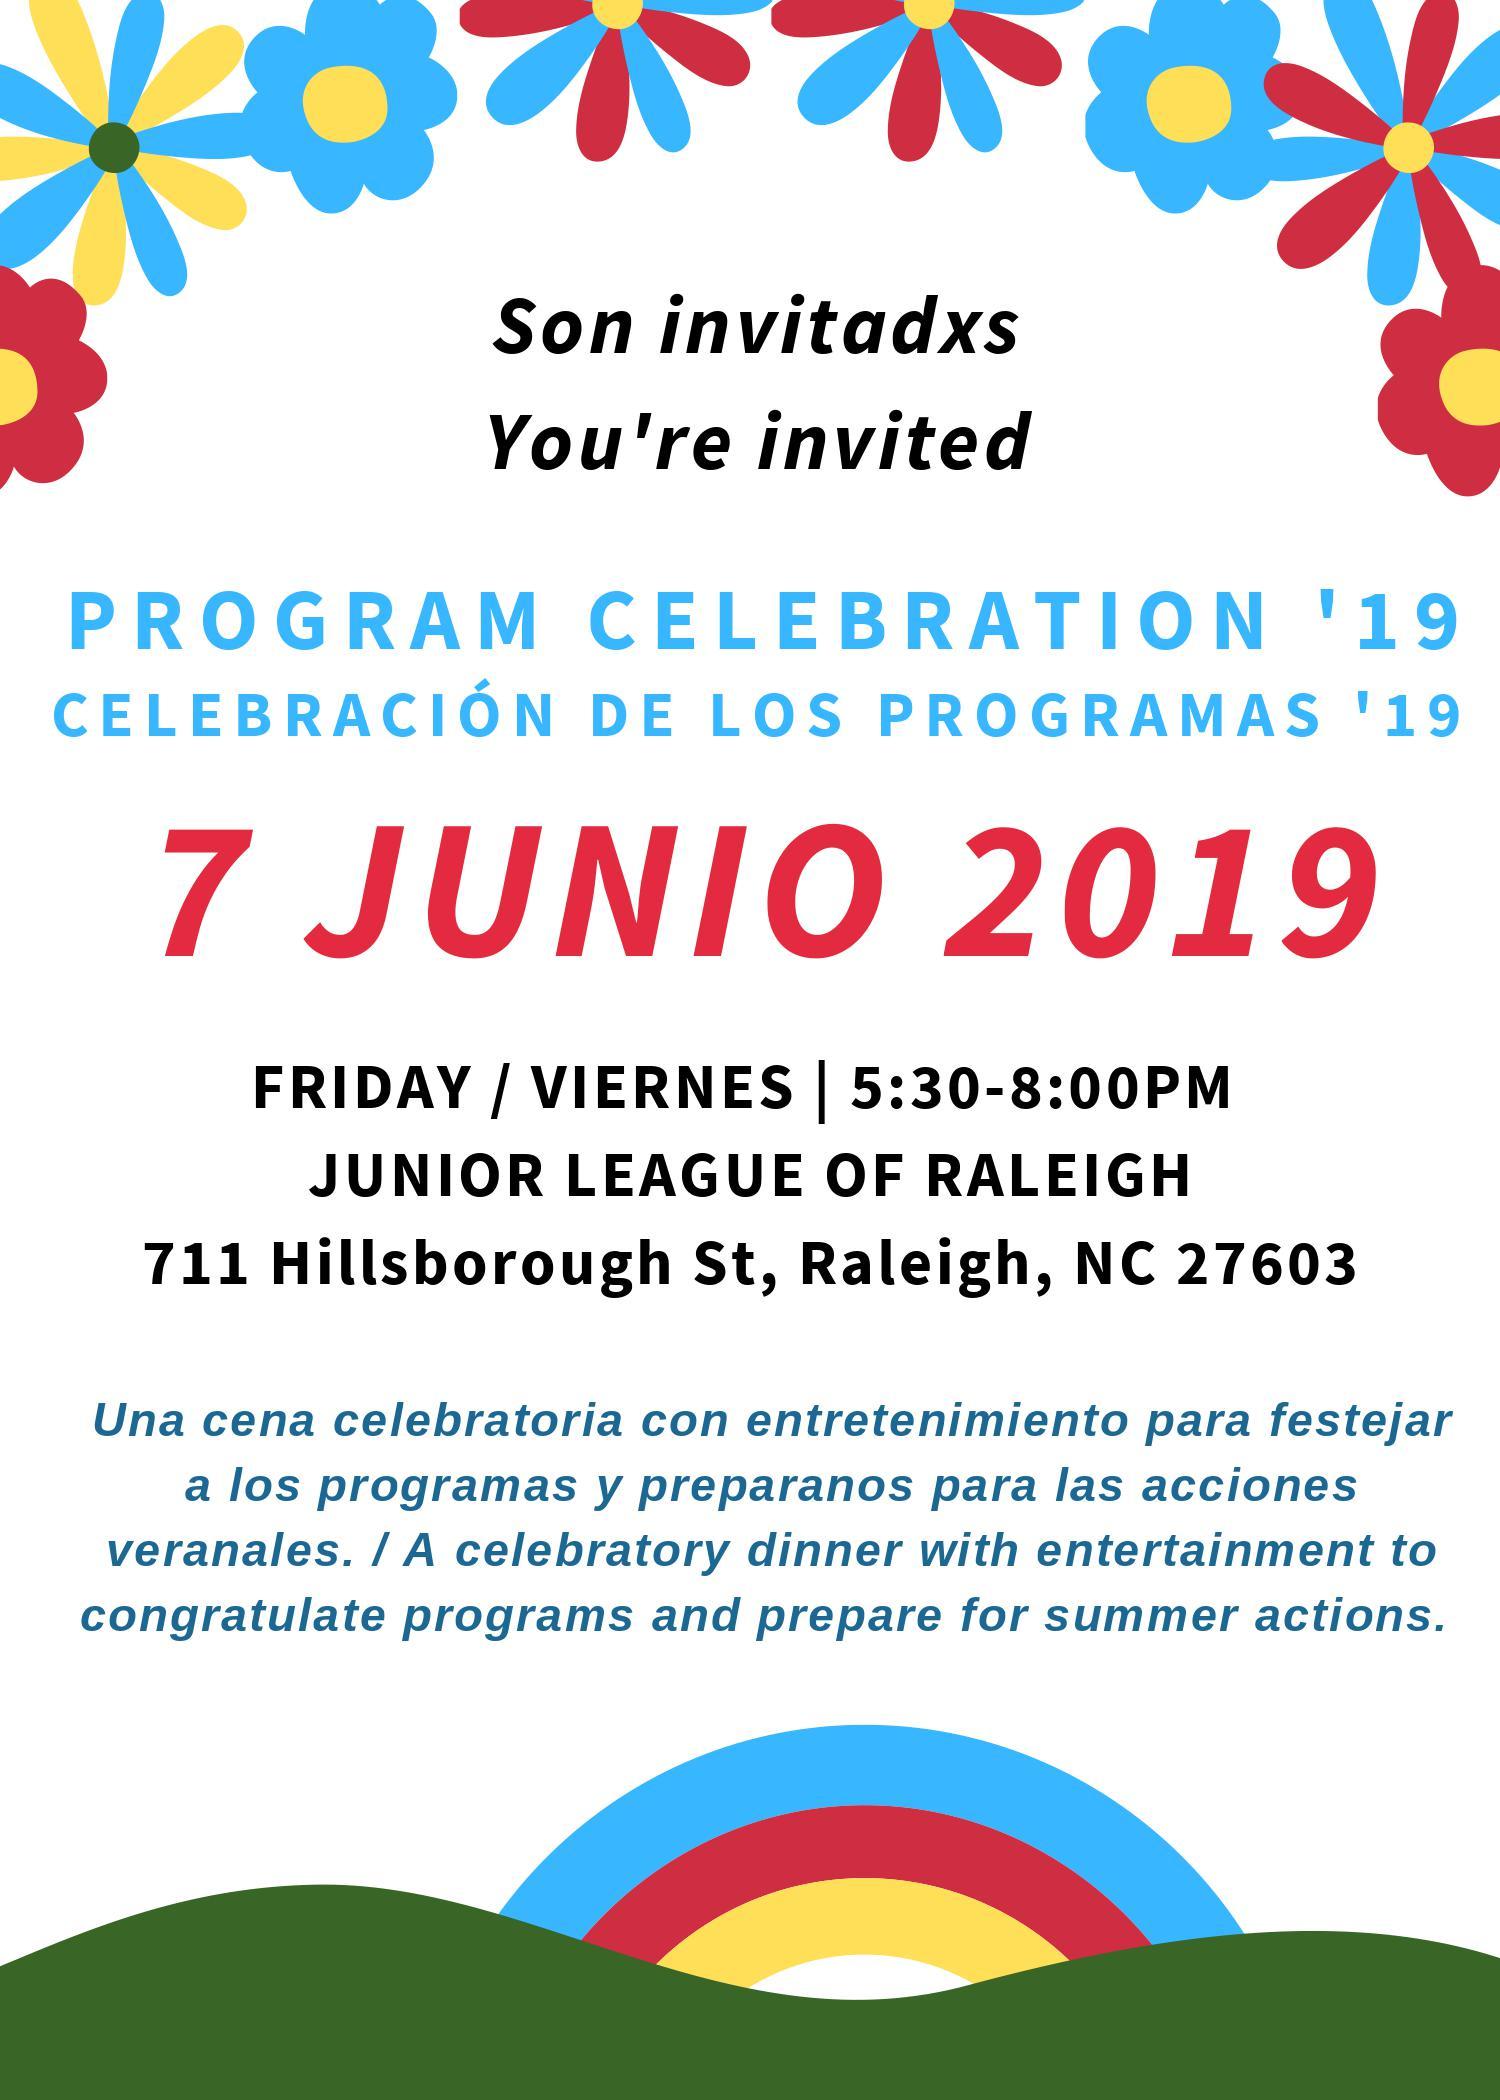 Graduation ceremony info